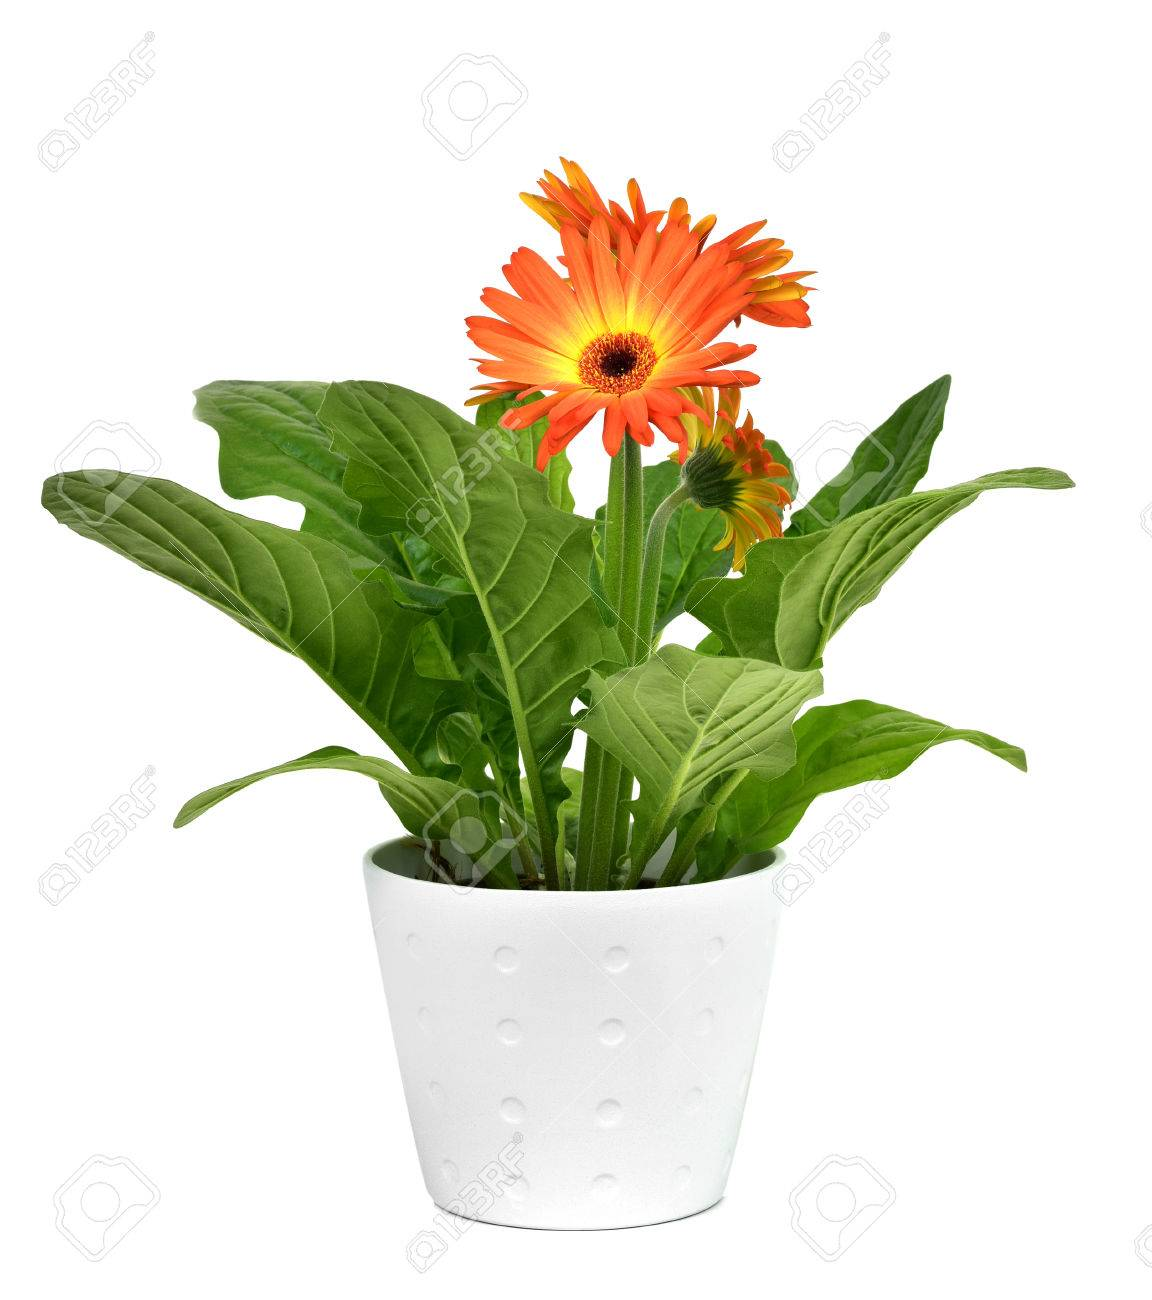 Primer Plano De Una Planta De La Margarita Del Gerbera Naranja En ...